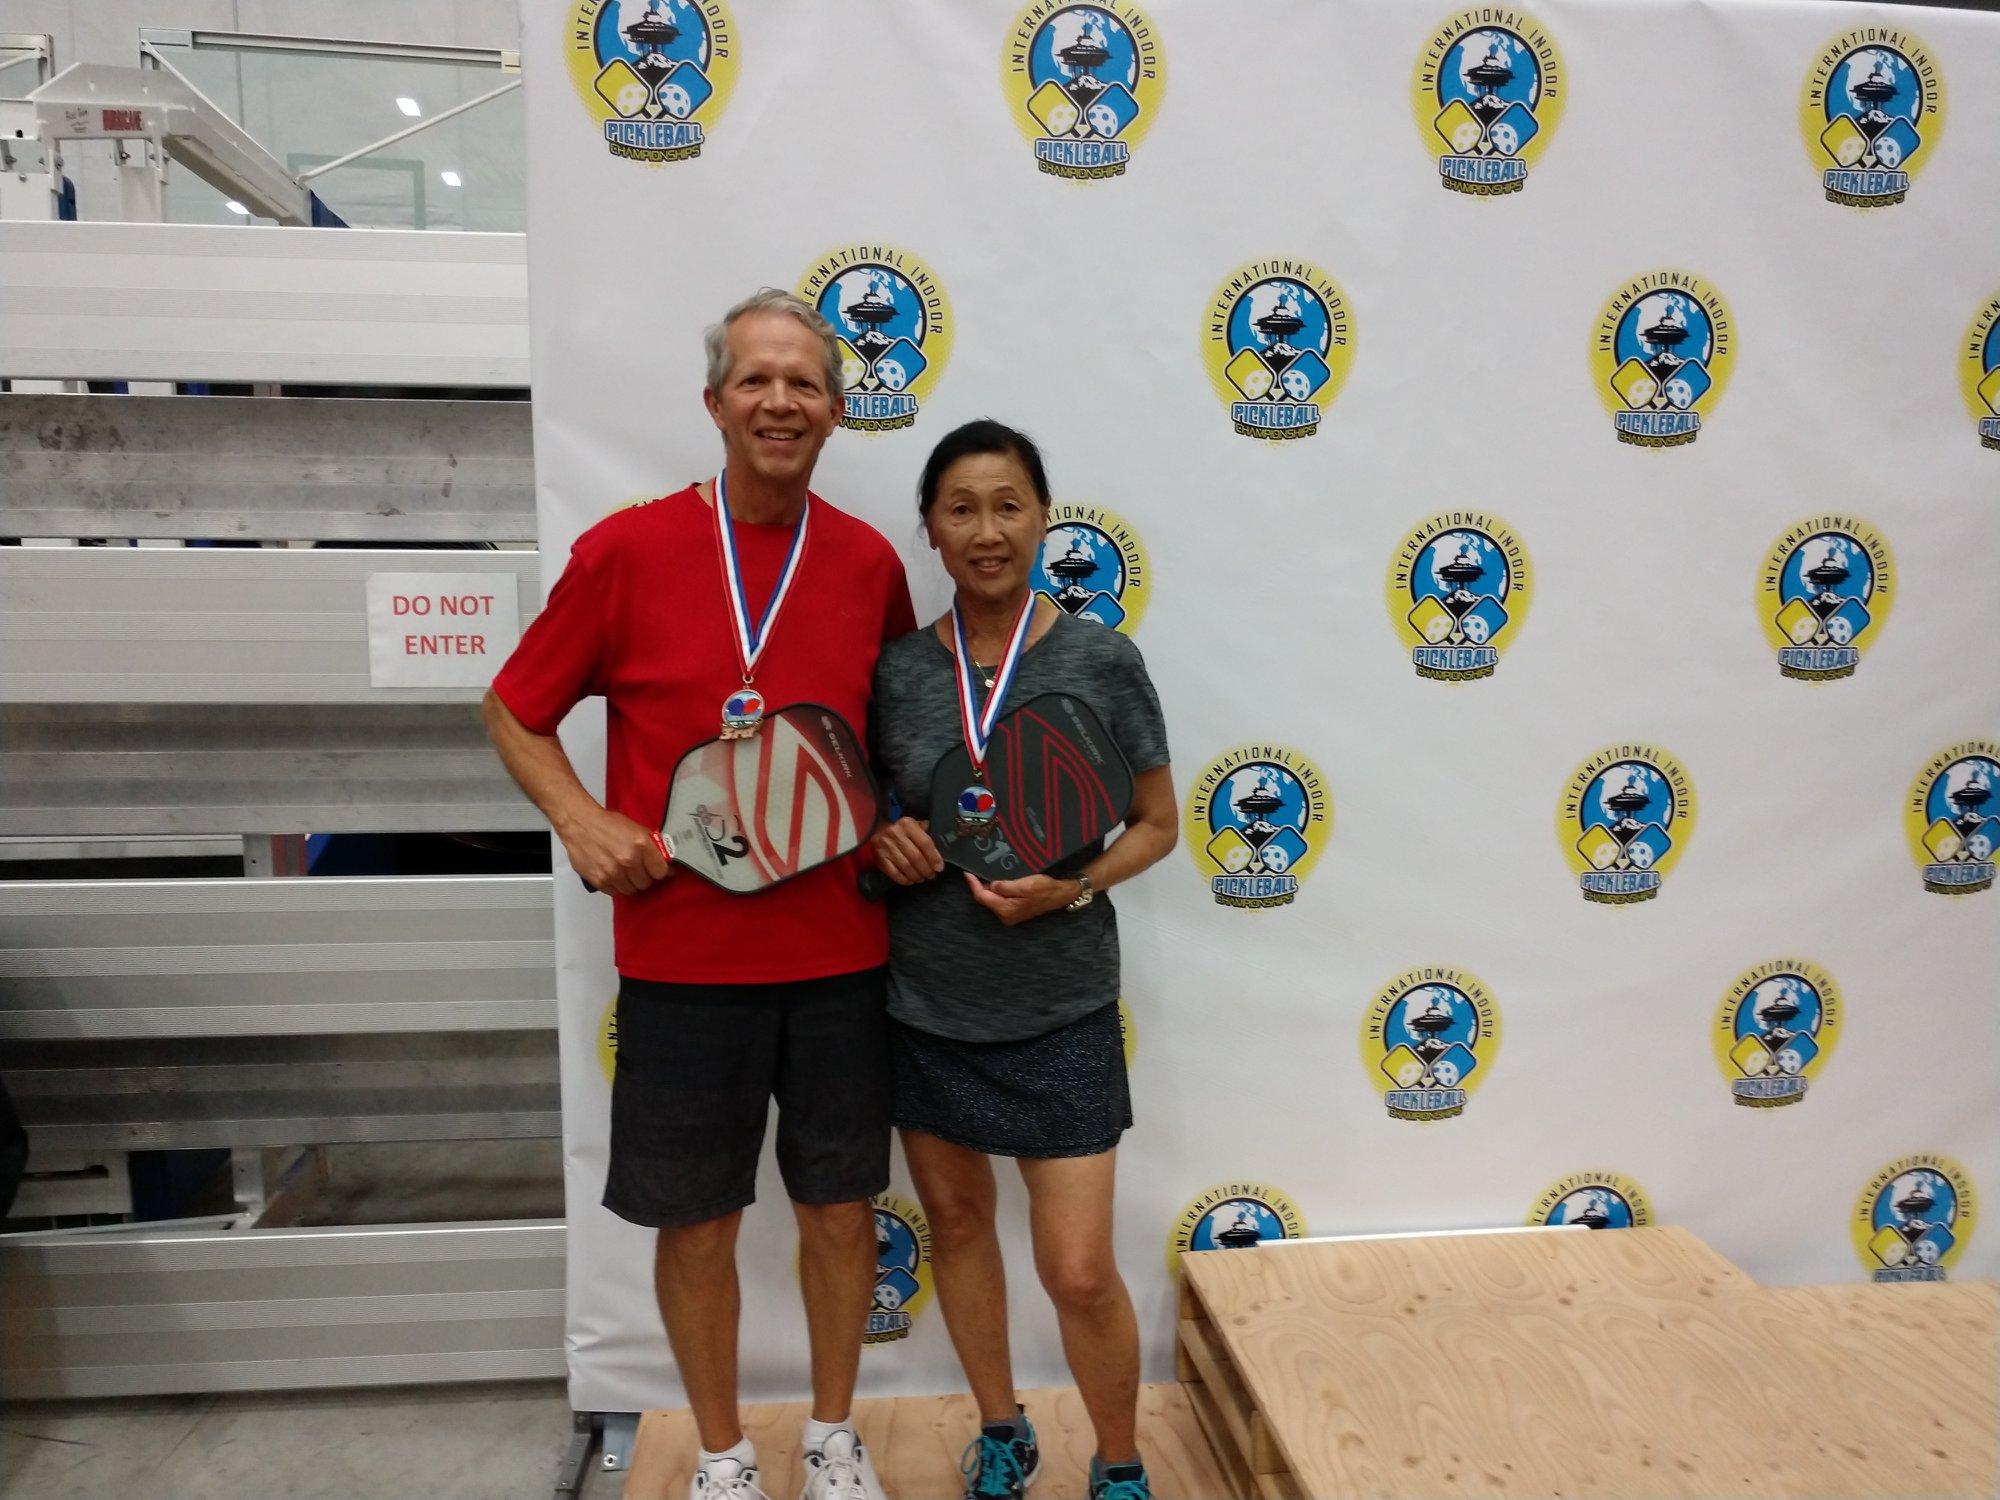 Mixed Doubles 3.5, 60+Ruby Pugh/Charlie Pugh - Bronze